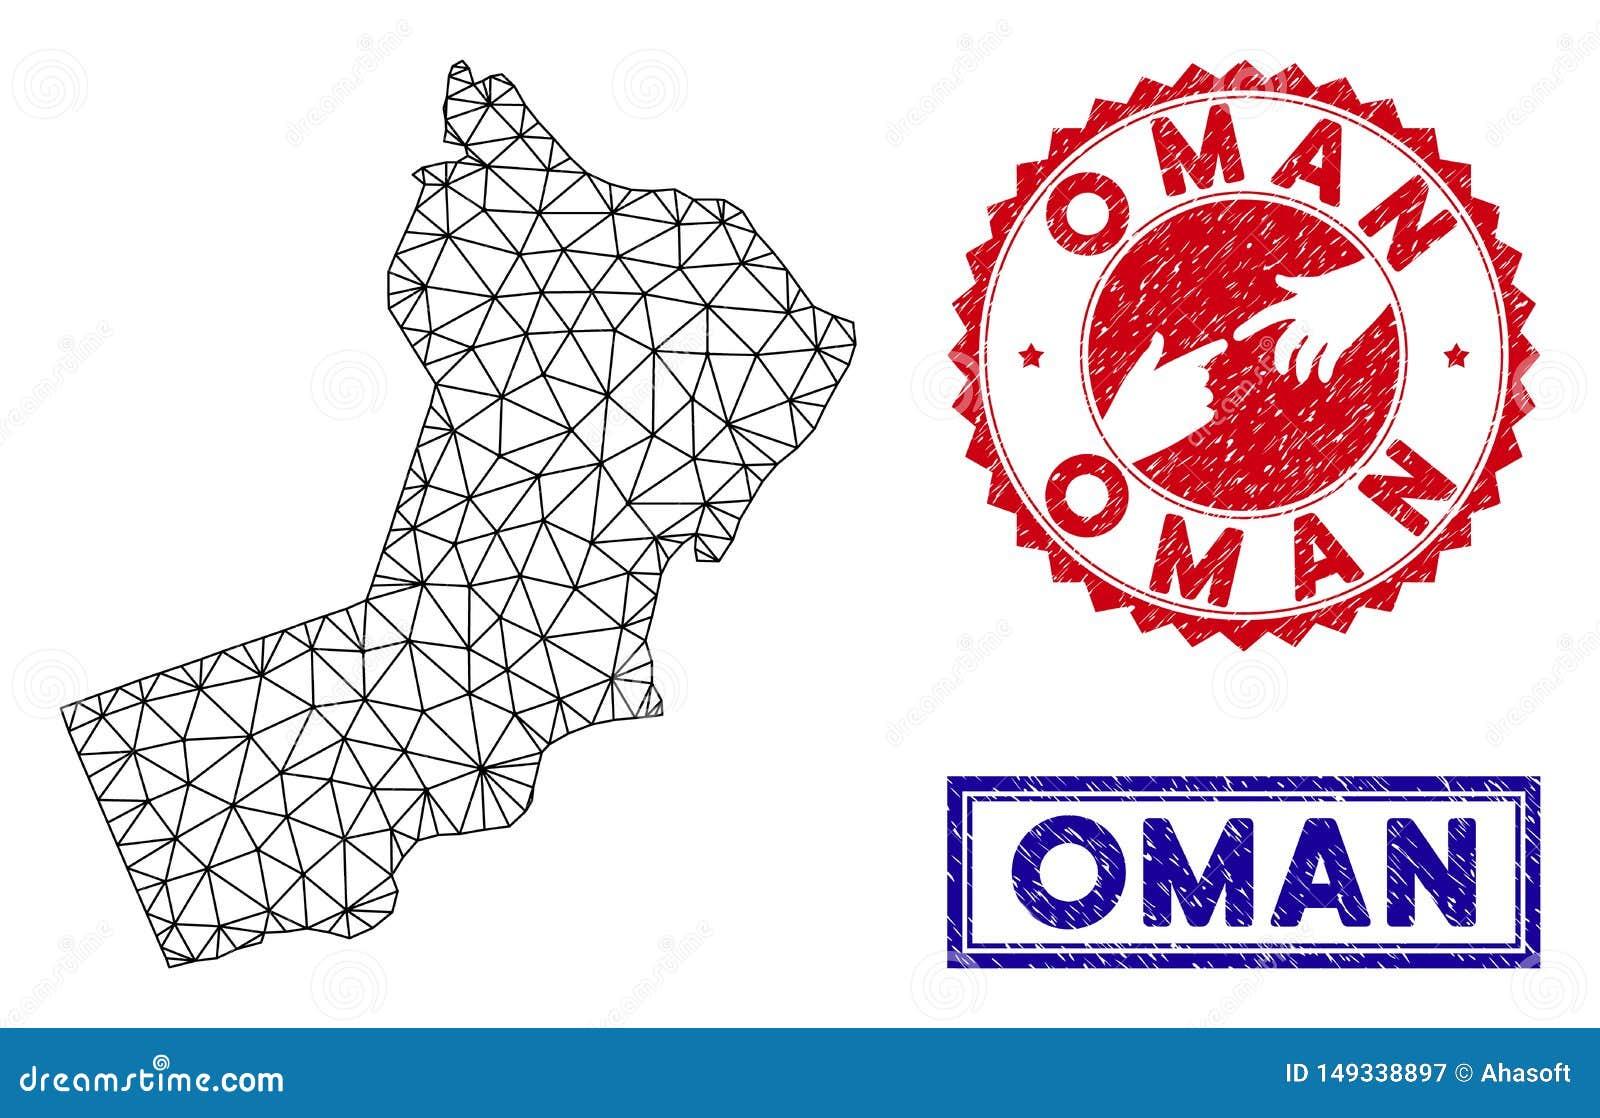 Polygonal Mesh Oman Map and Grunge Stamps